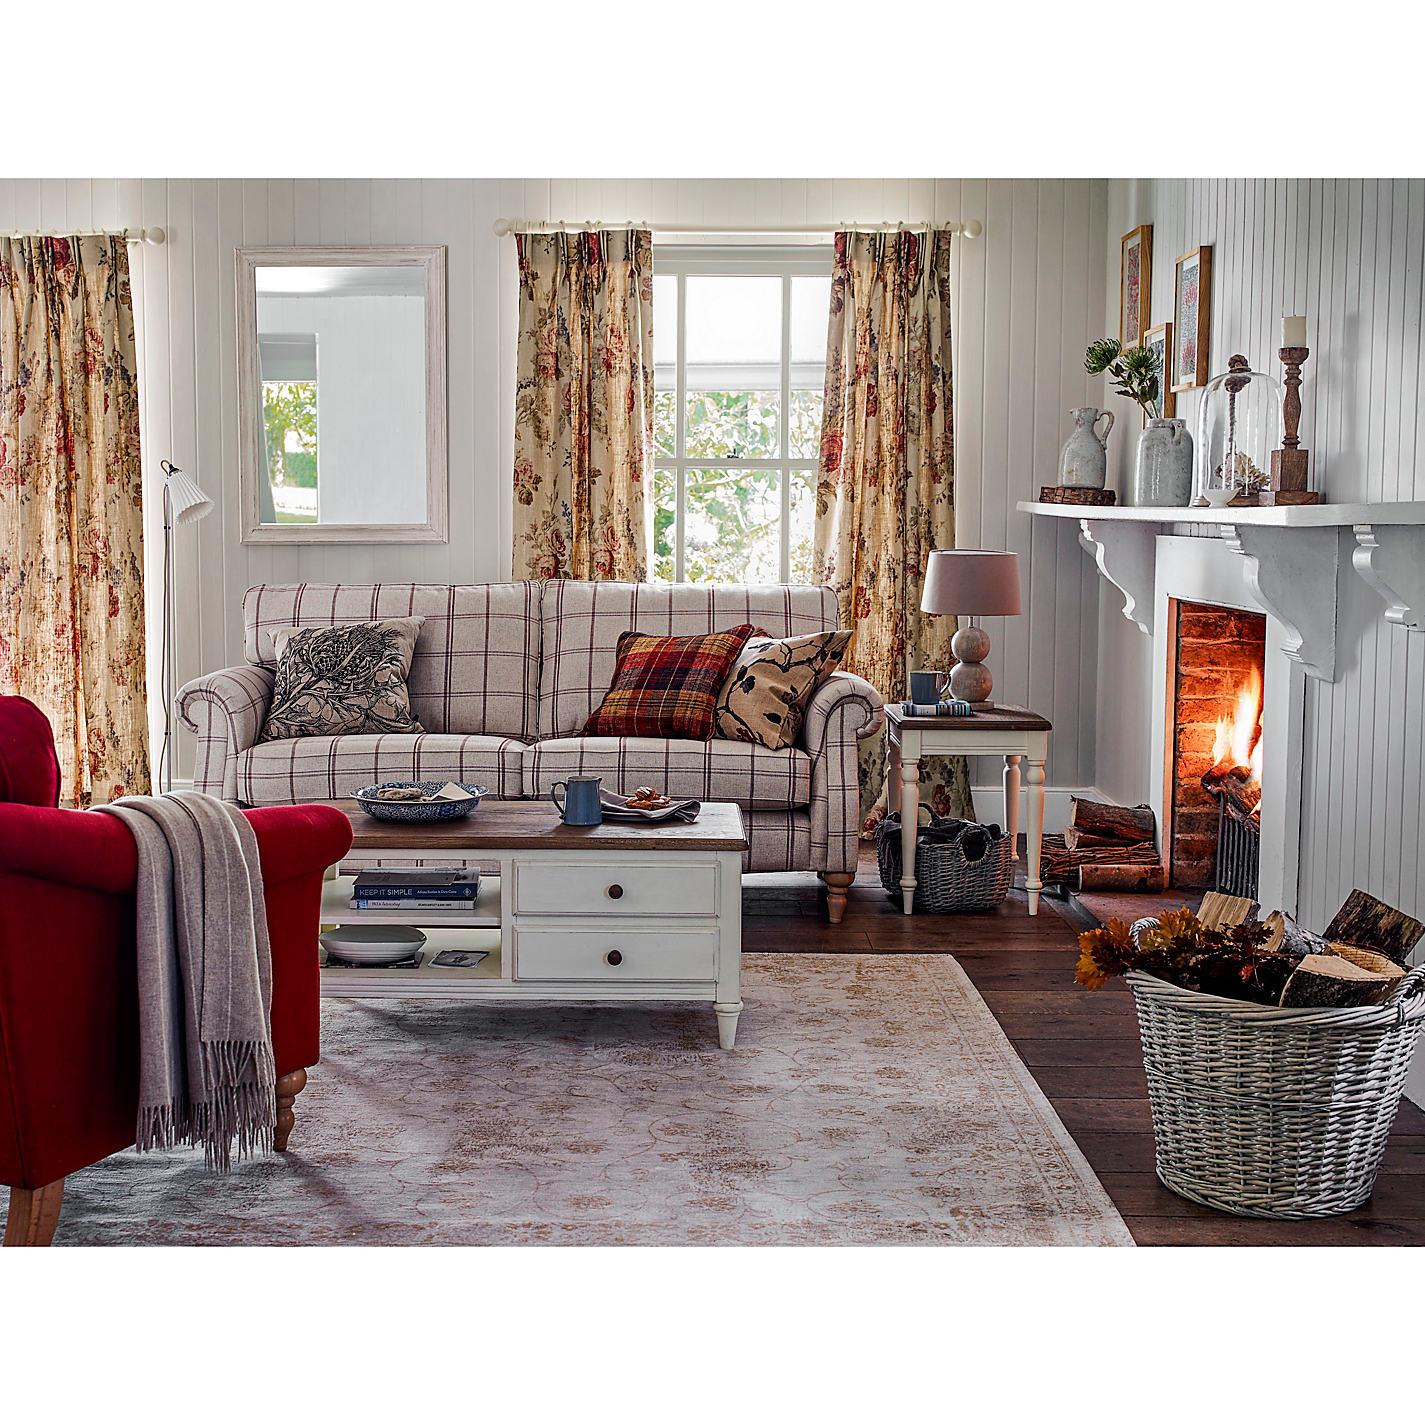 John Lewis Living Room Living Room Rug John Lewis Best Living Room 2017